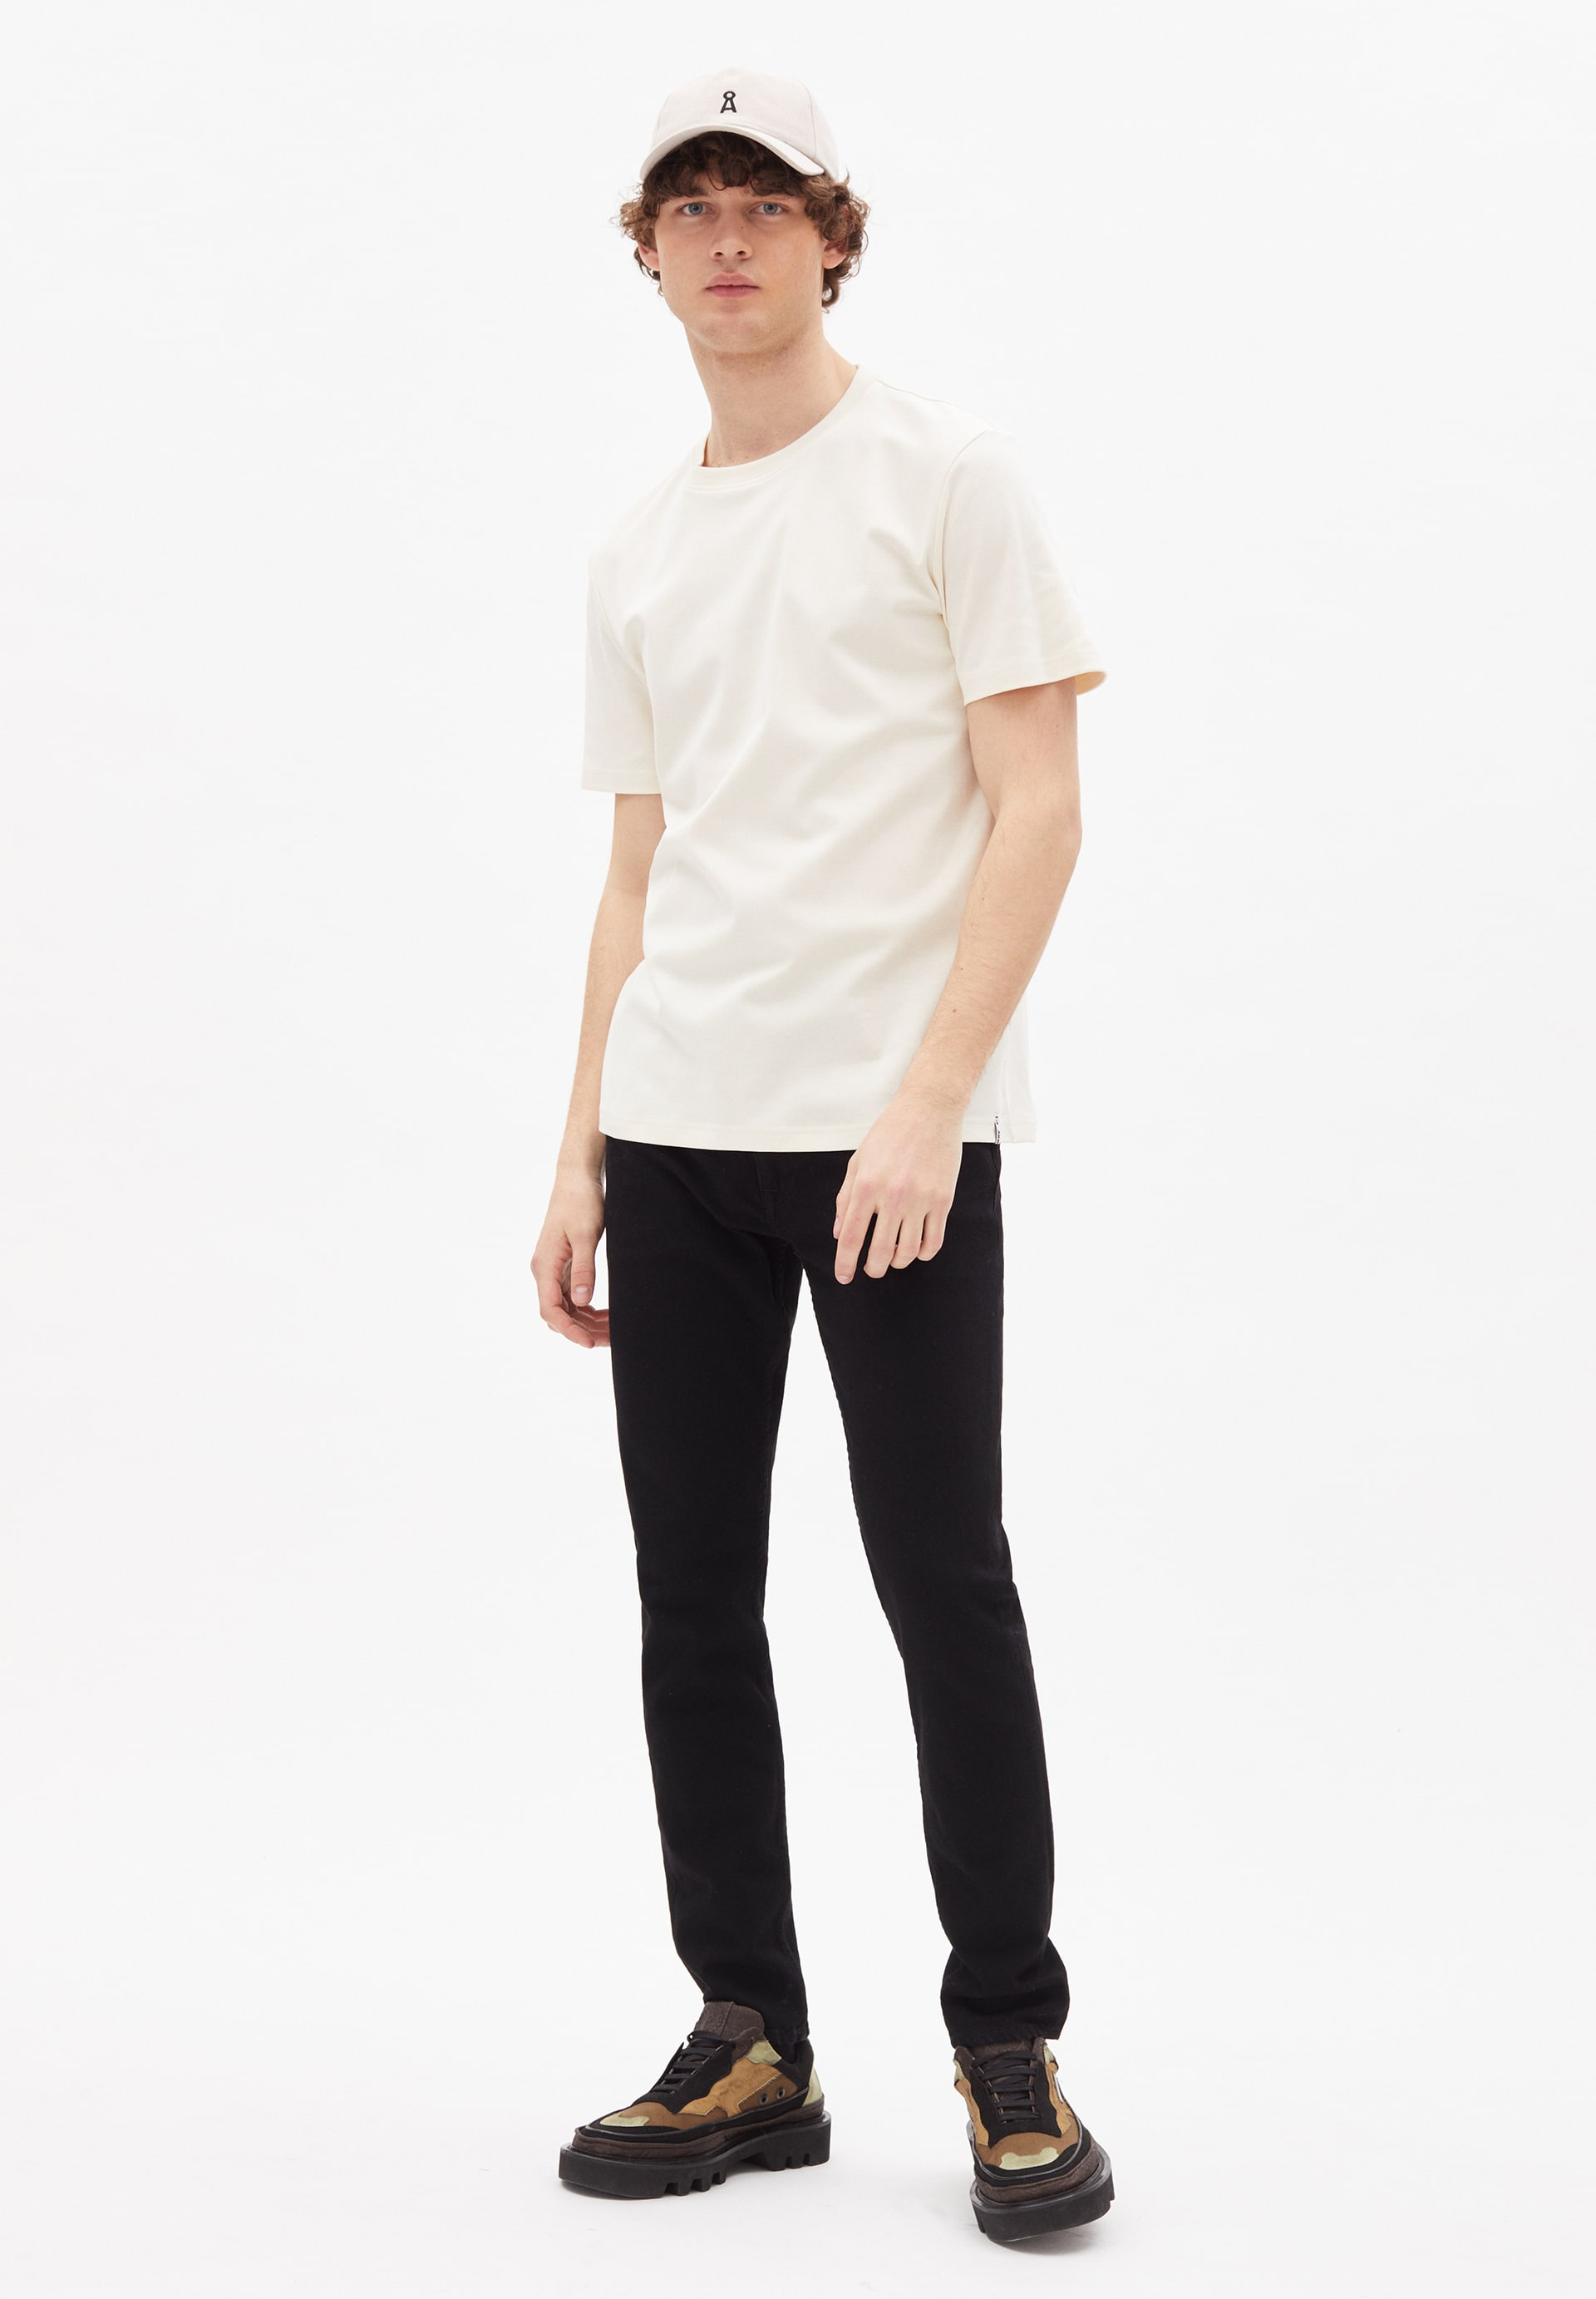 WAADO UNDYED T-Shirt made of Organic Cotton